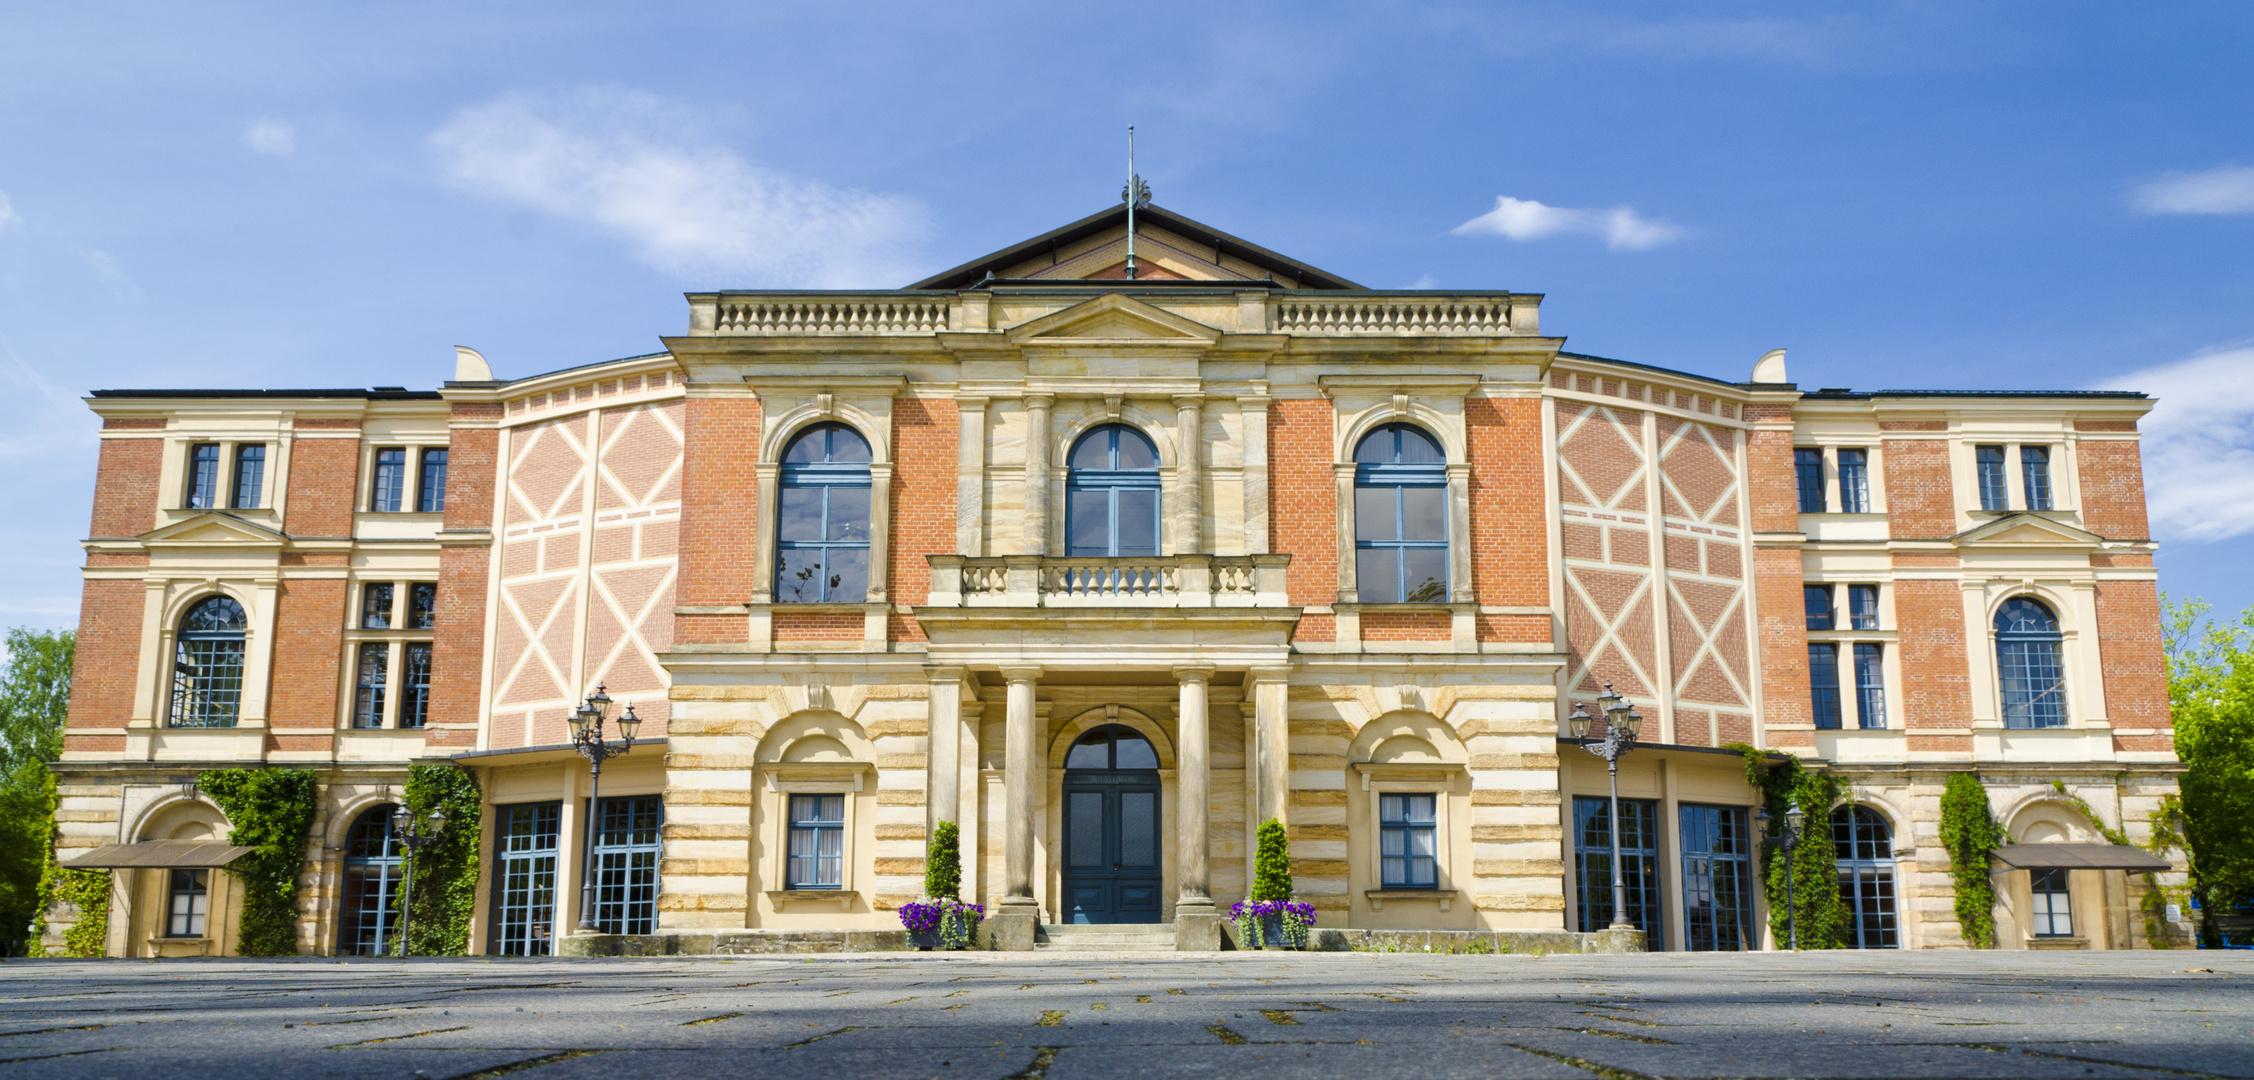 Festspielhaus III